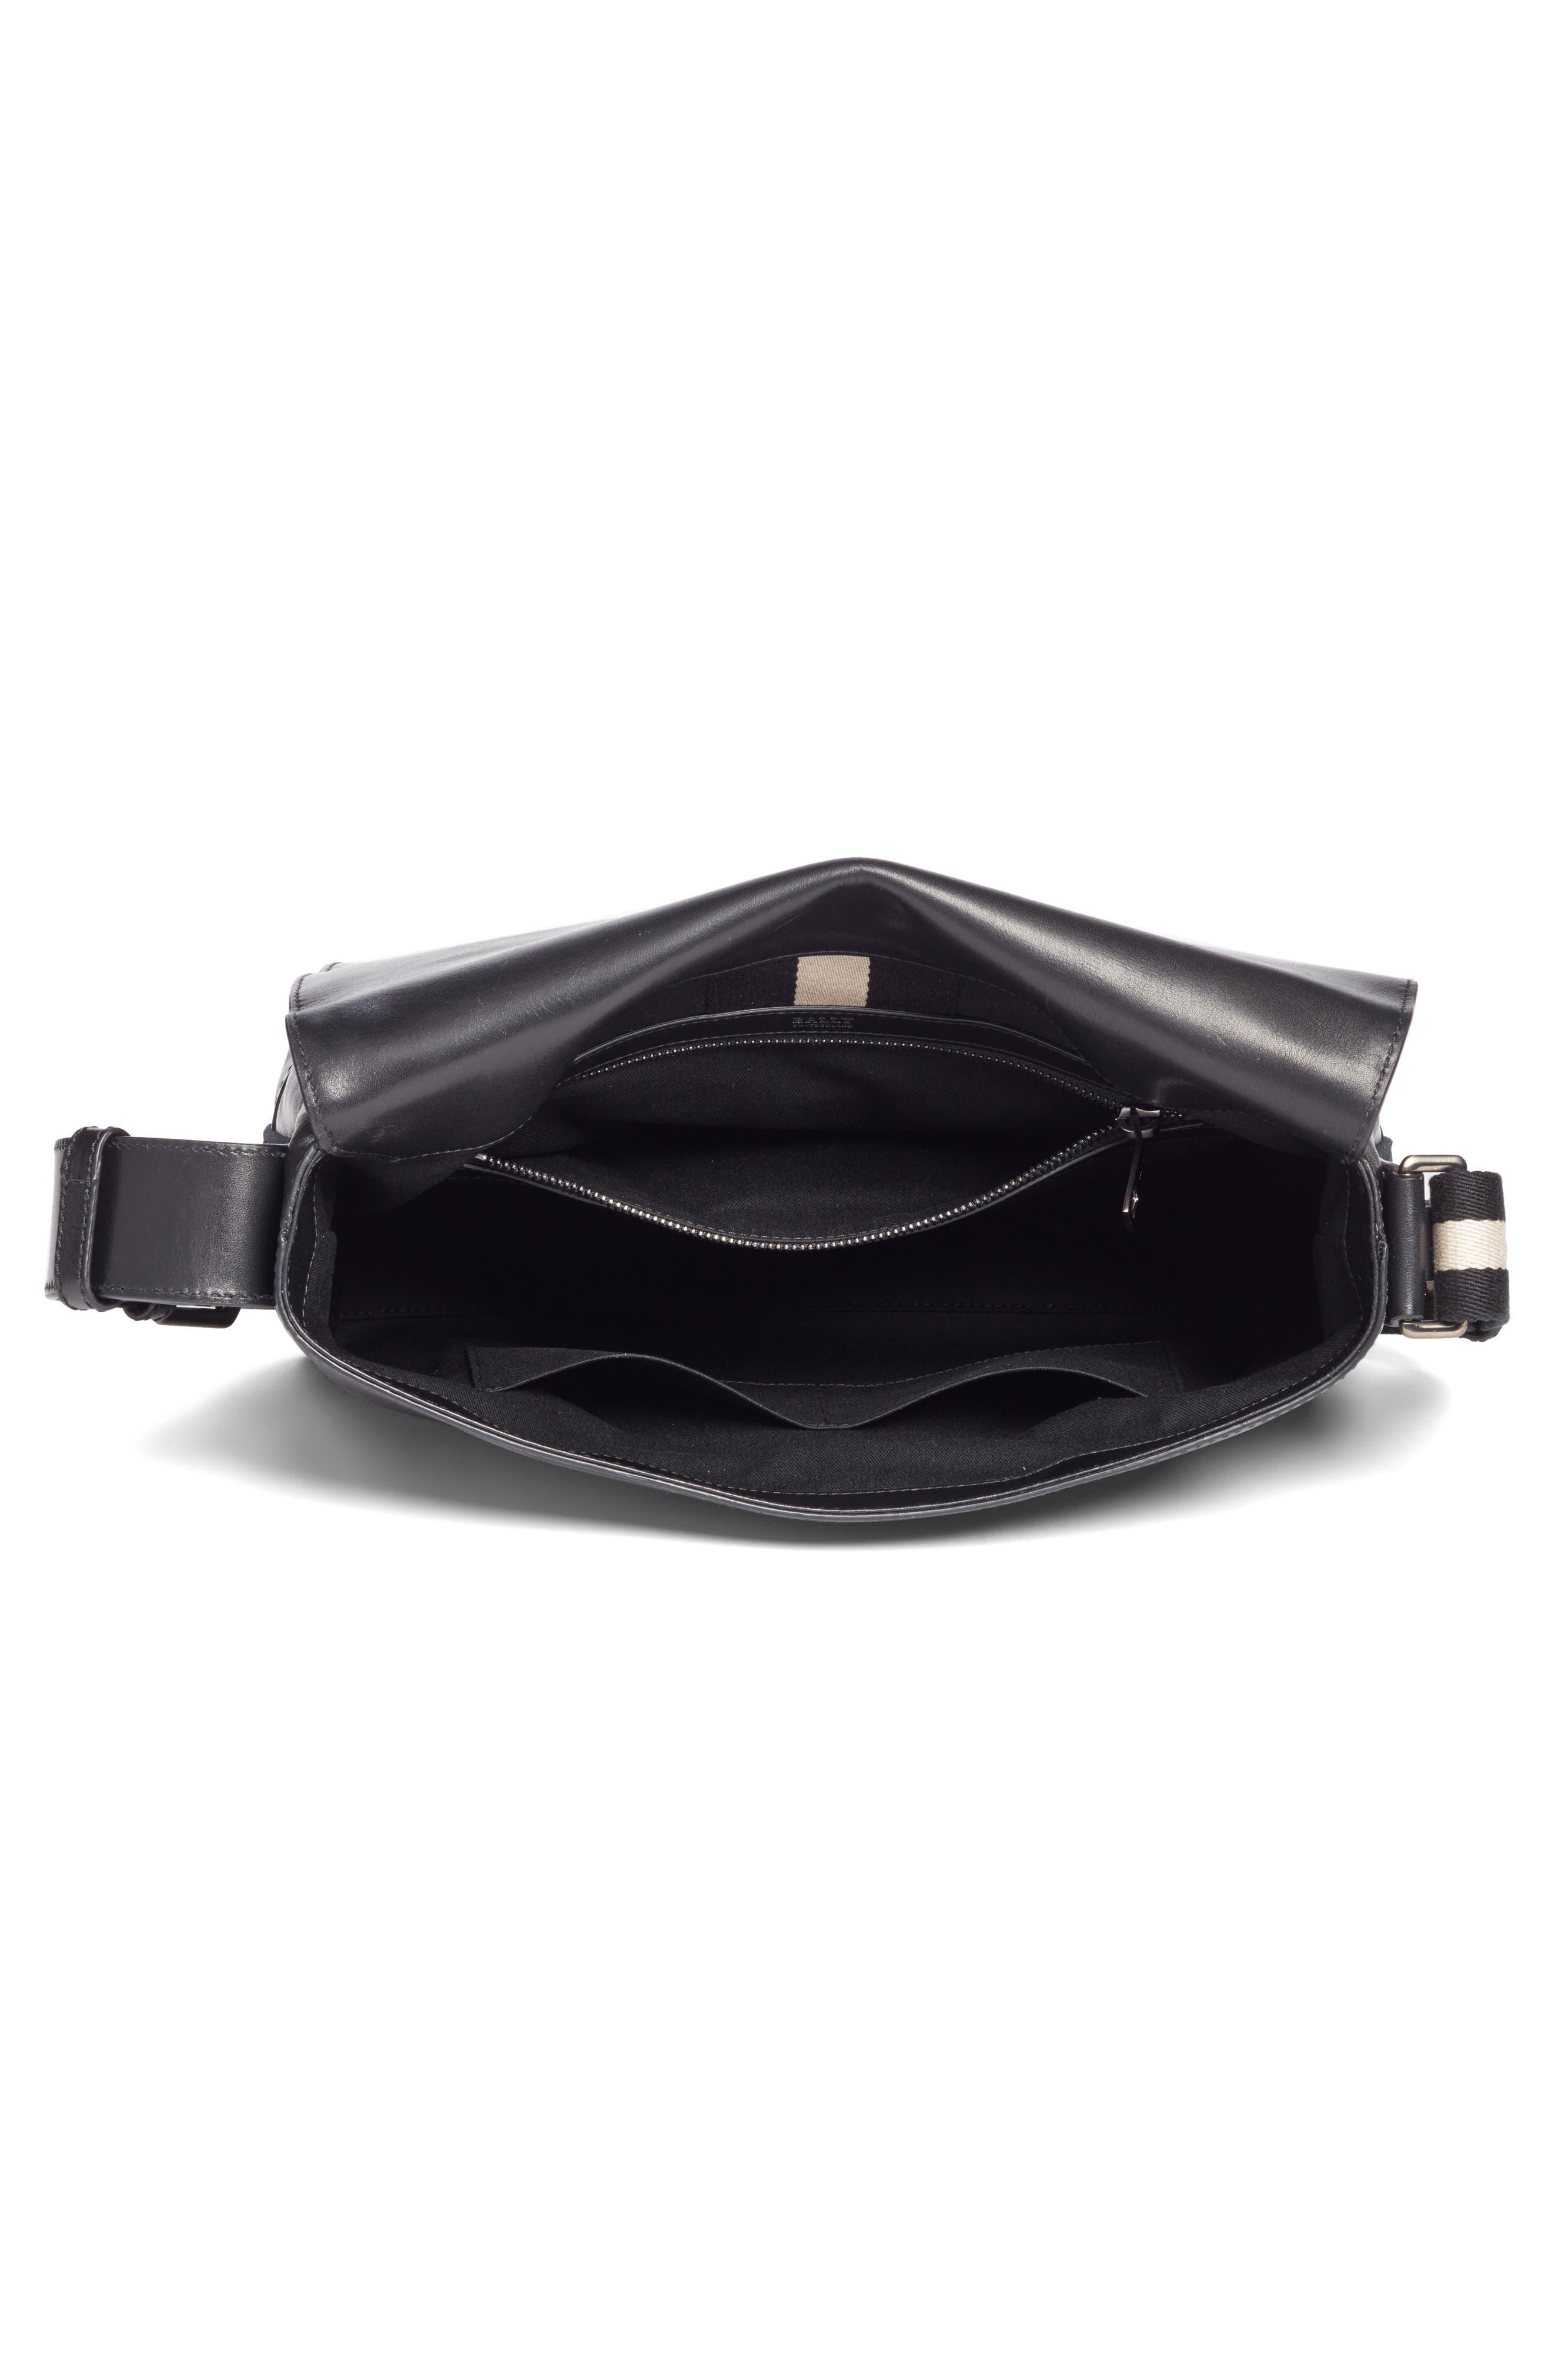 Tamrac Leather Messenger Bag,                             Alternate thumbnail 4, color,                             001